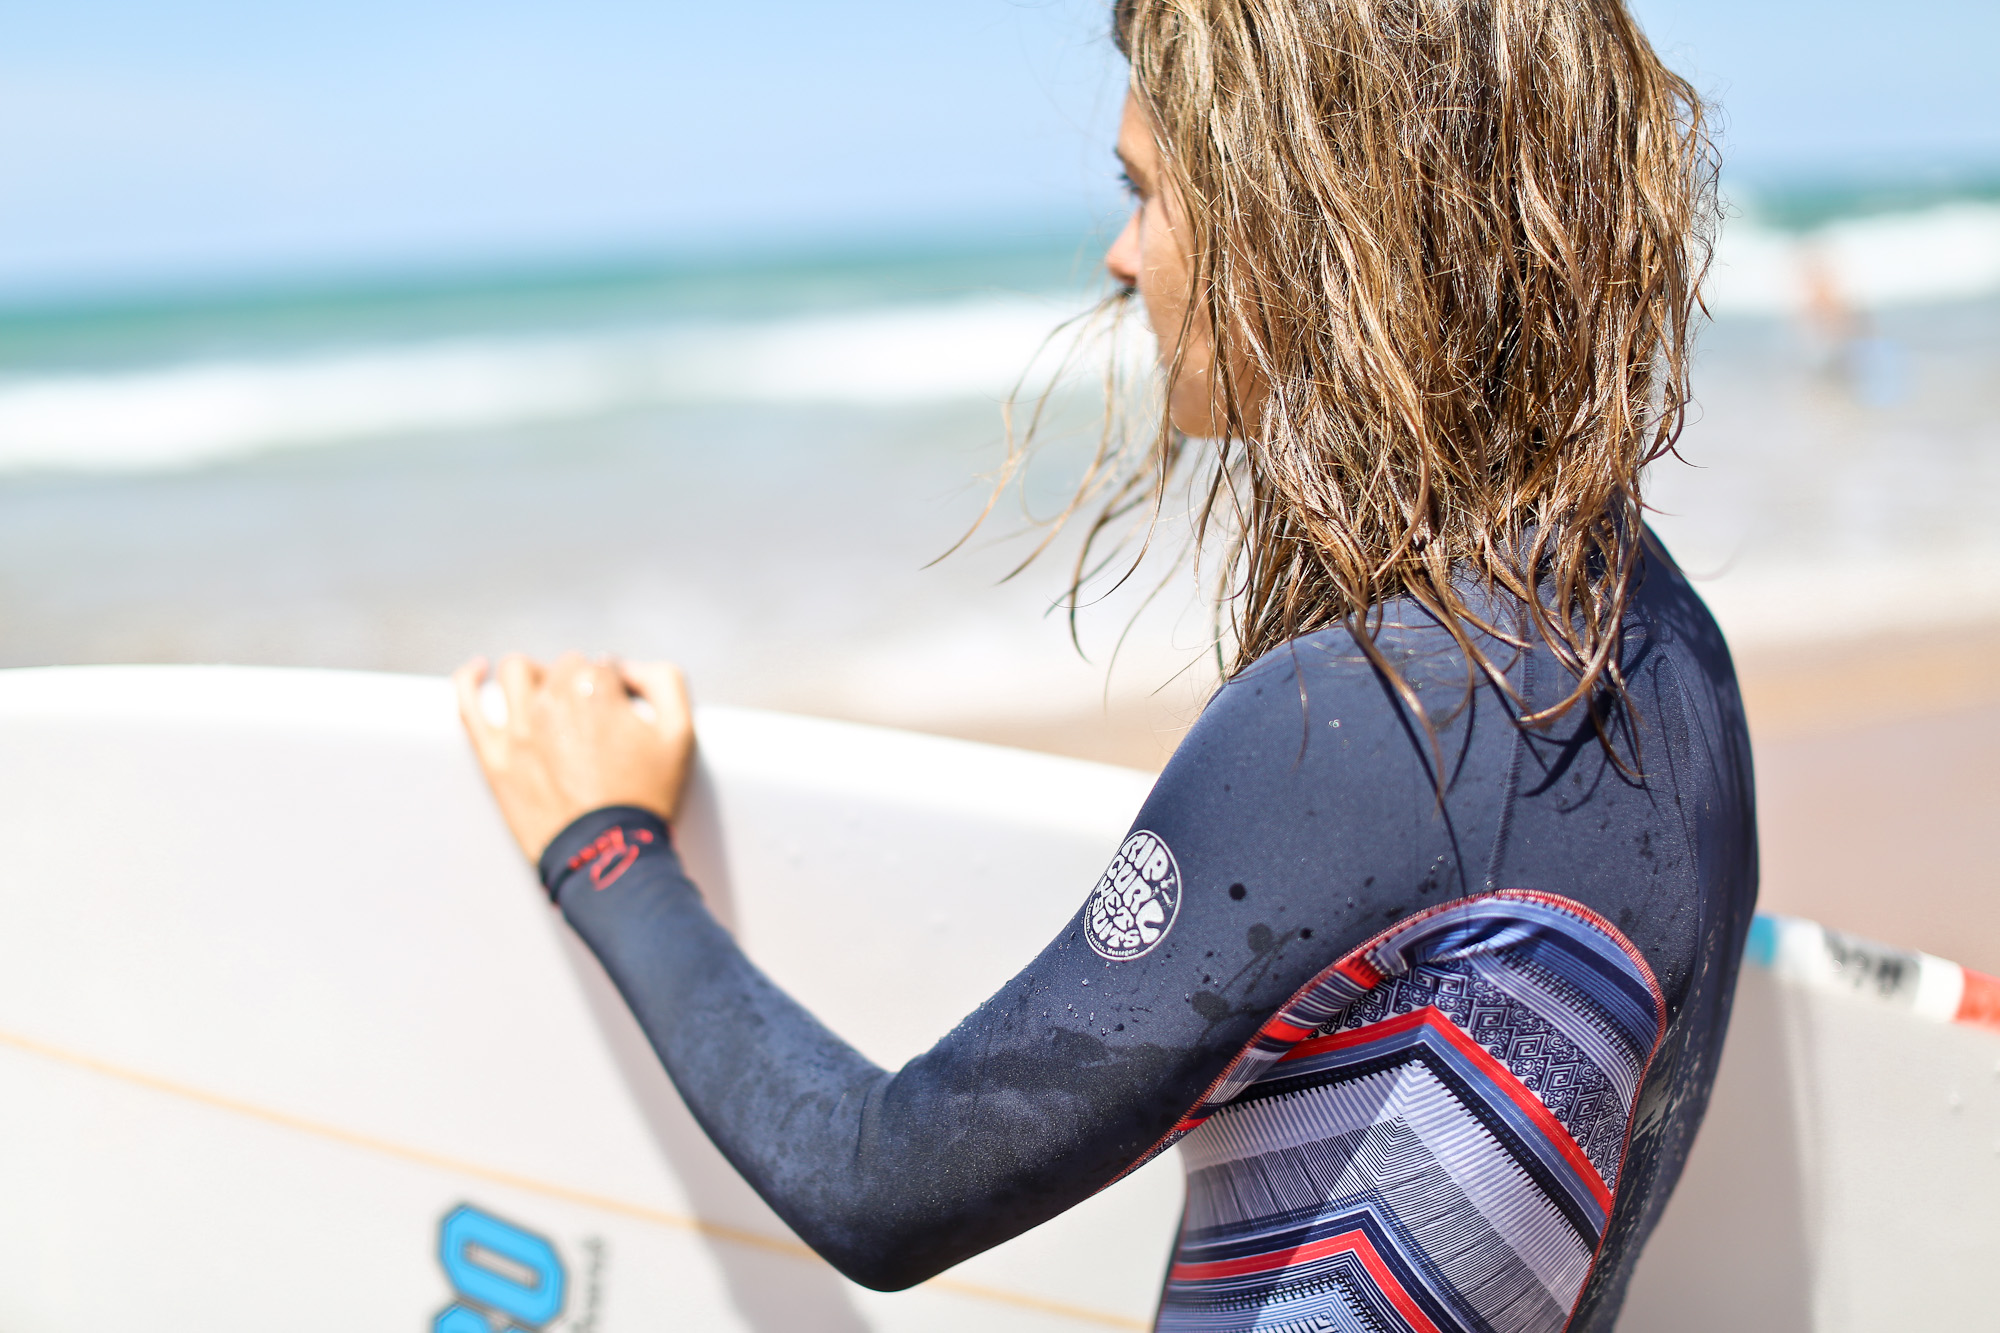 Clochet_surf_rip_curl_bombshell_wetsuit_5